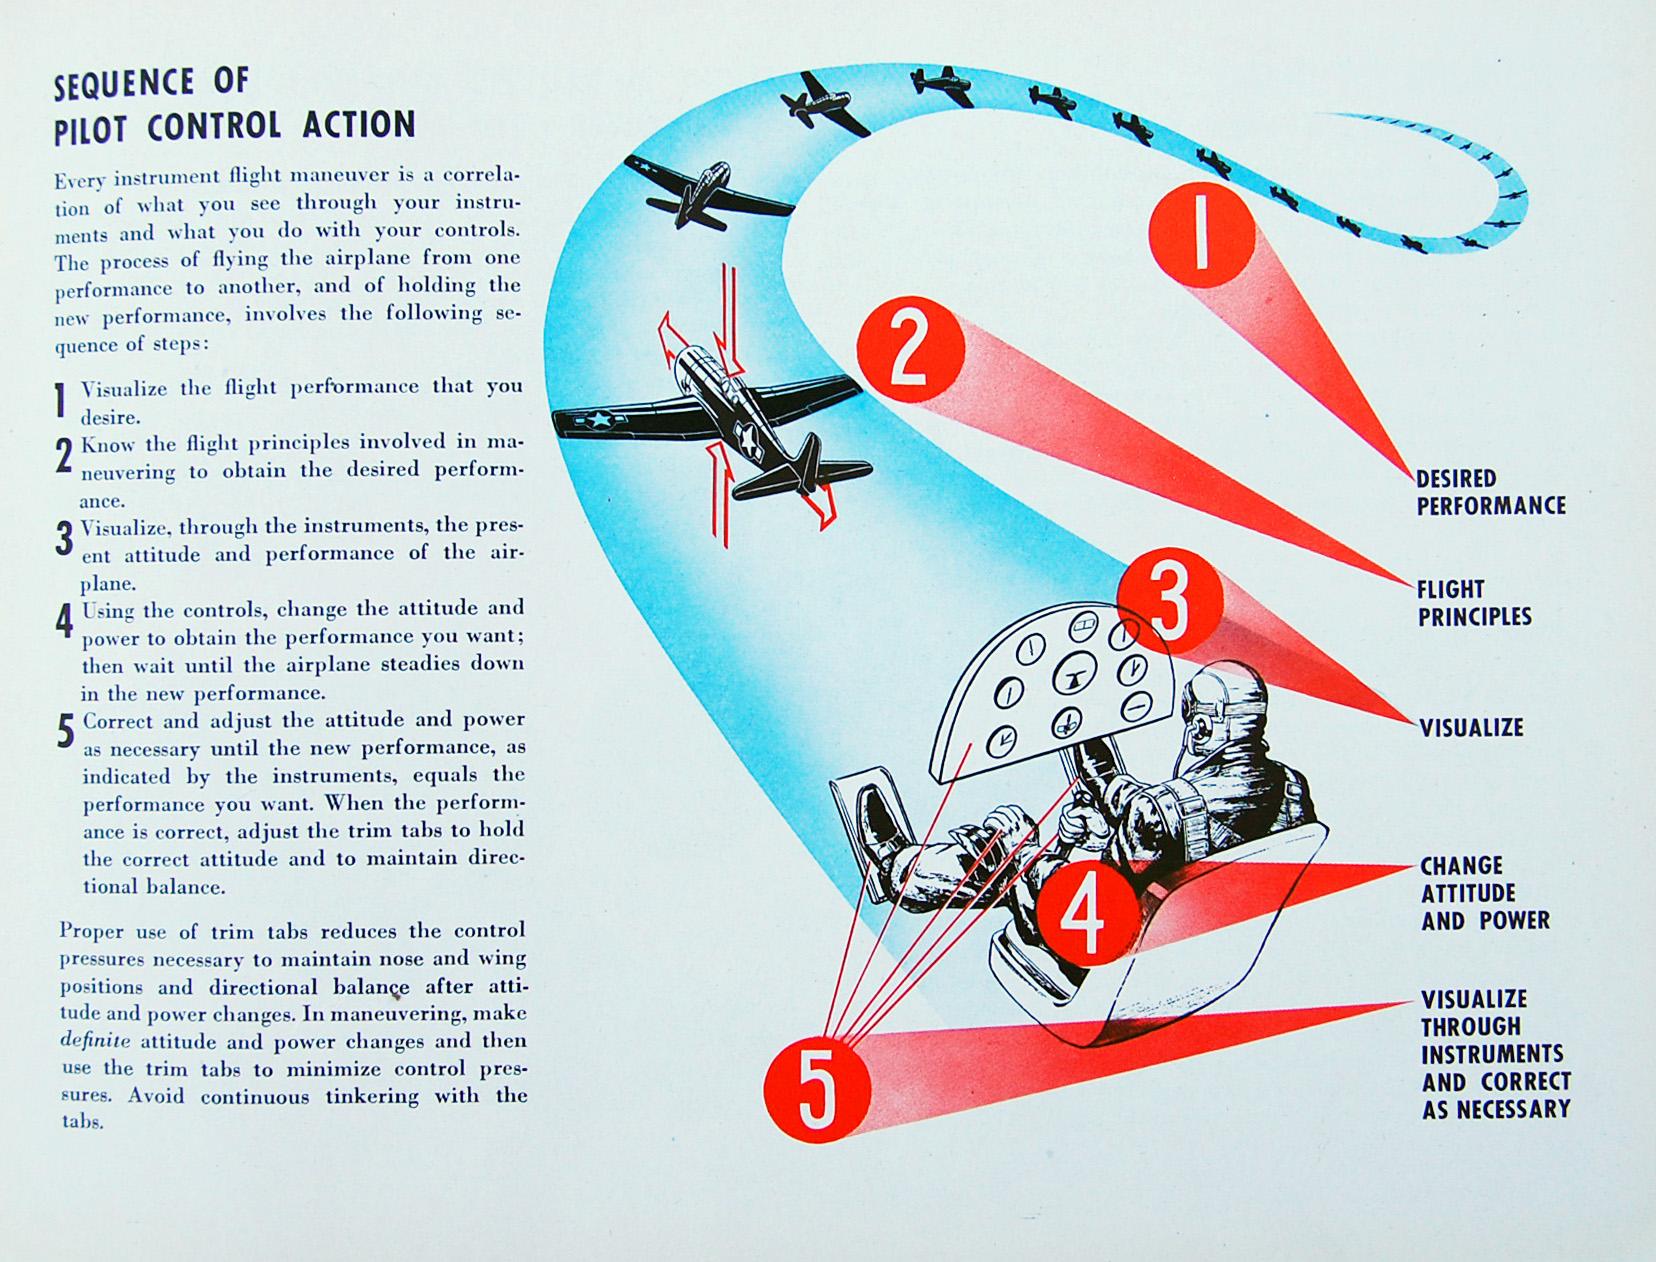 Flight Thru Instruments Manual Pilot Control Action